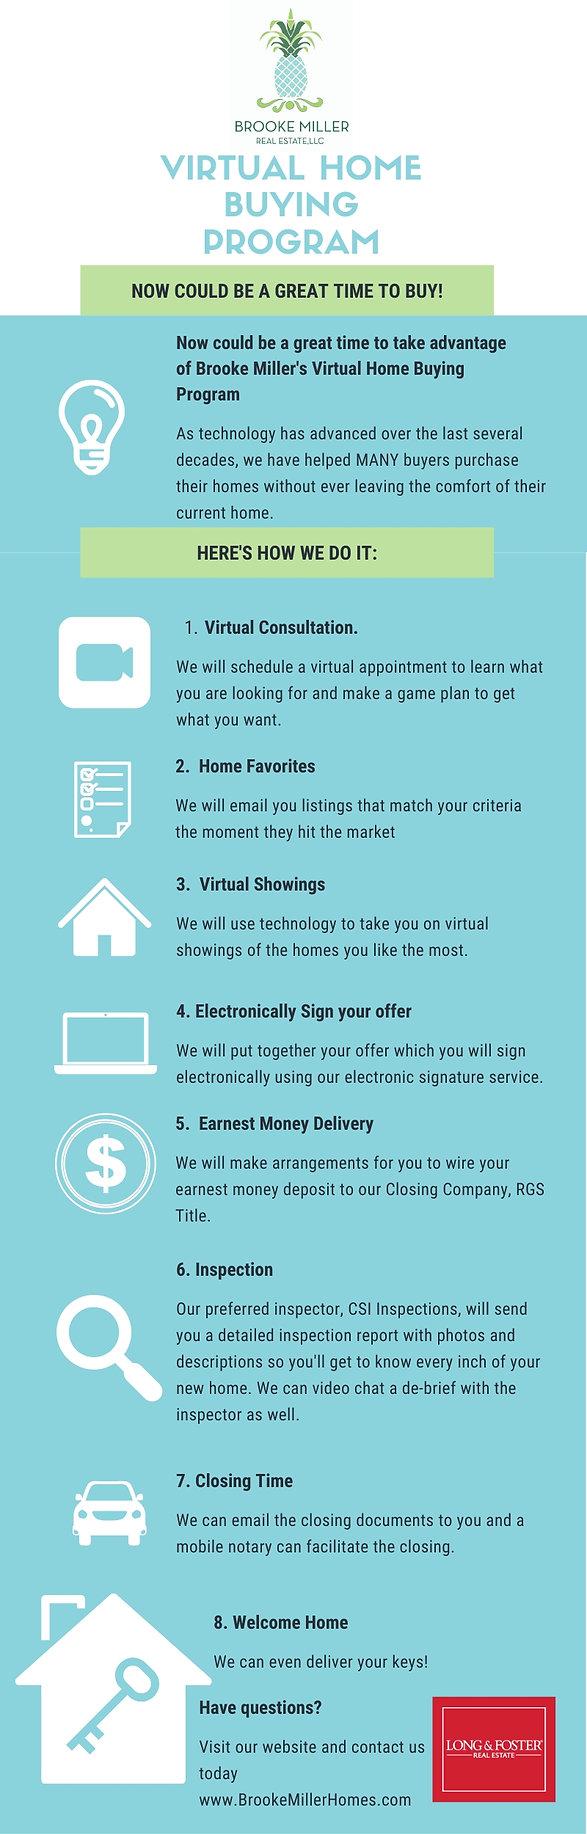 Virtual Home Buying Program Infographic.